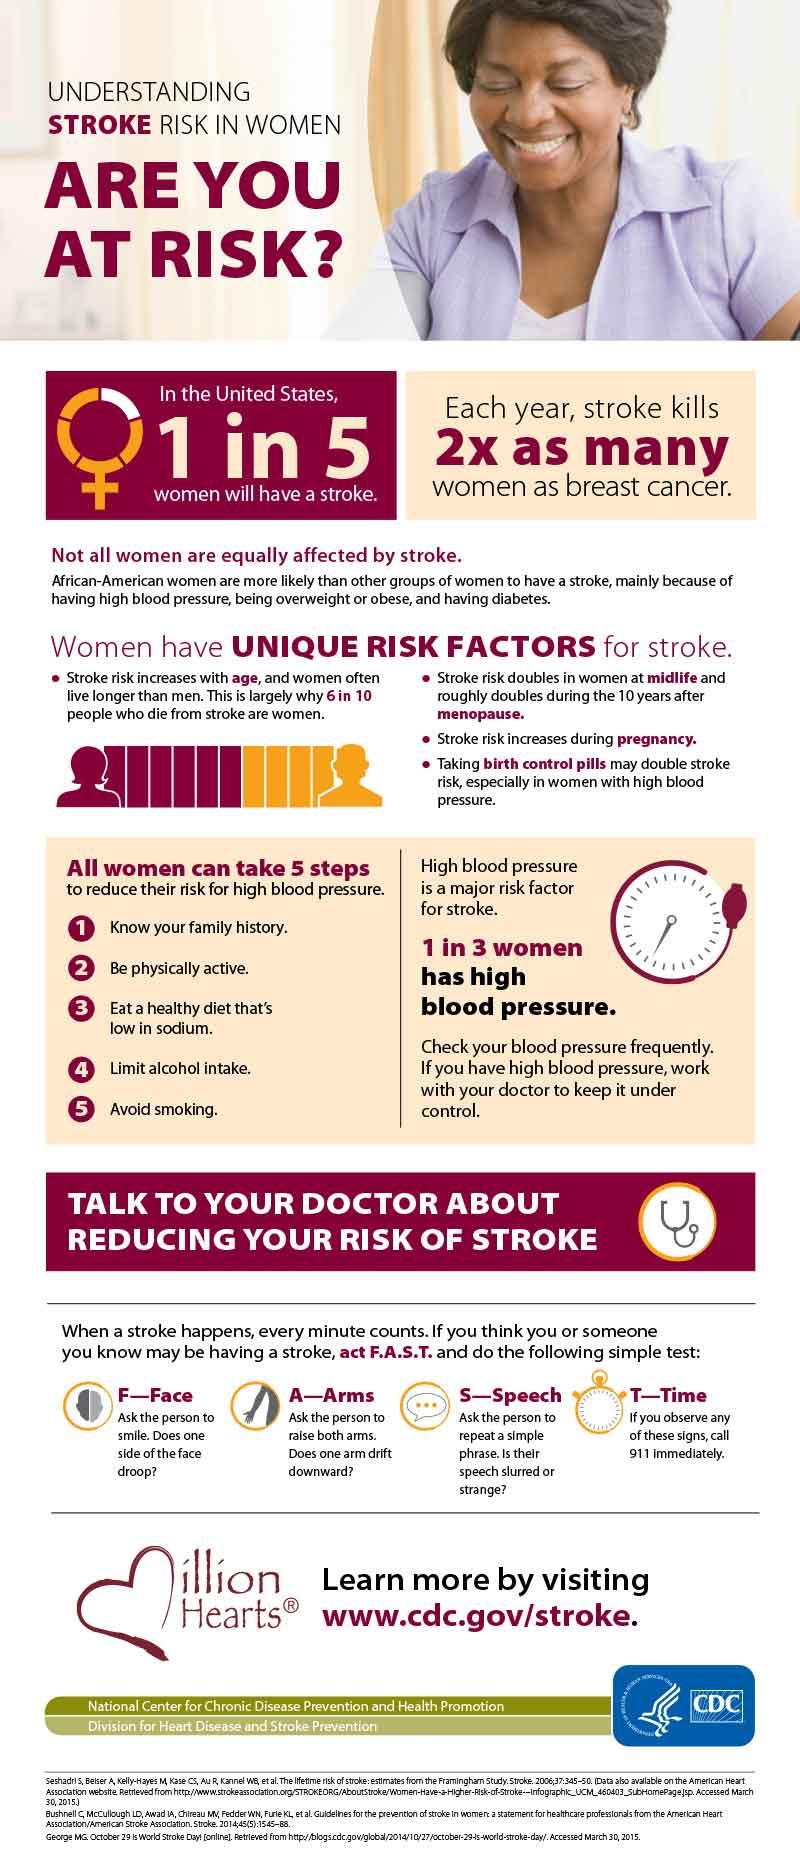 Performance health Program Stroke Risk in Women